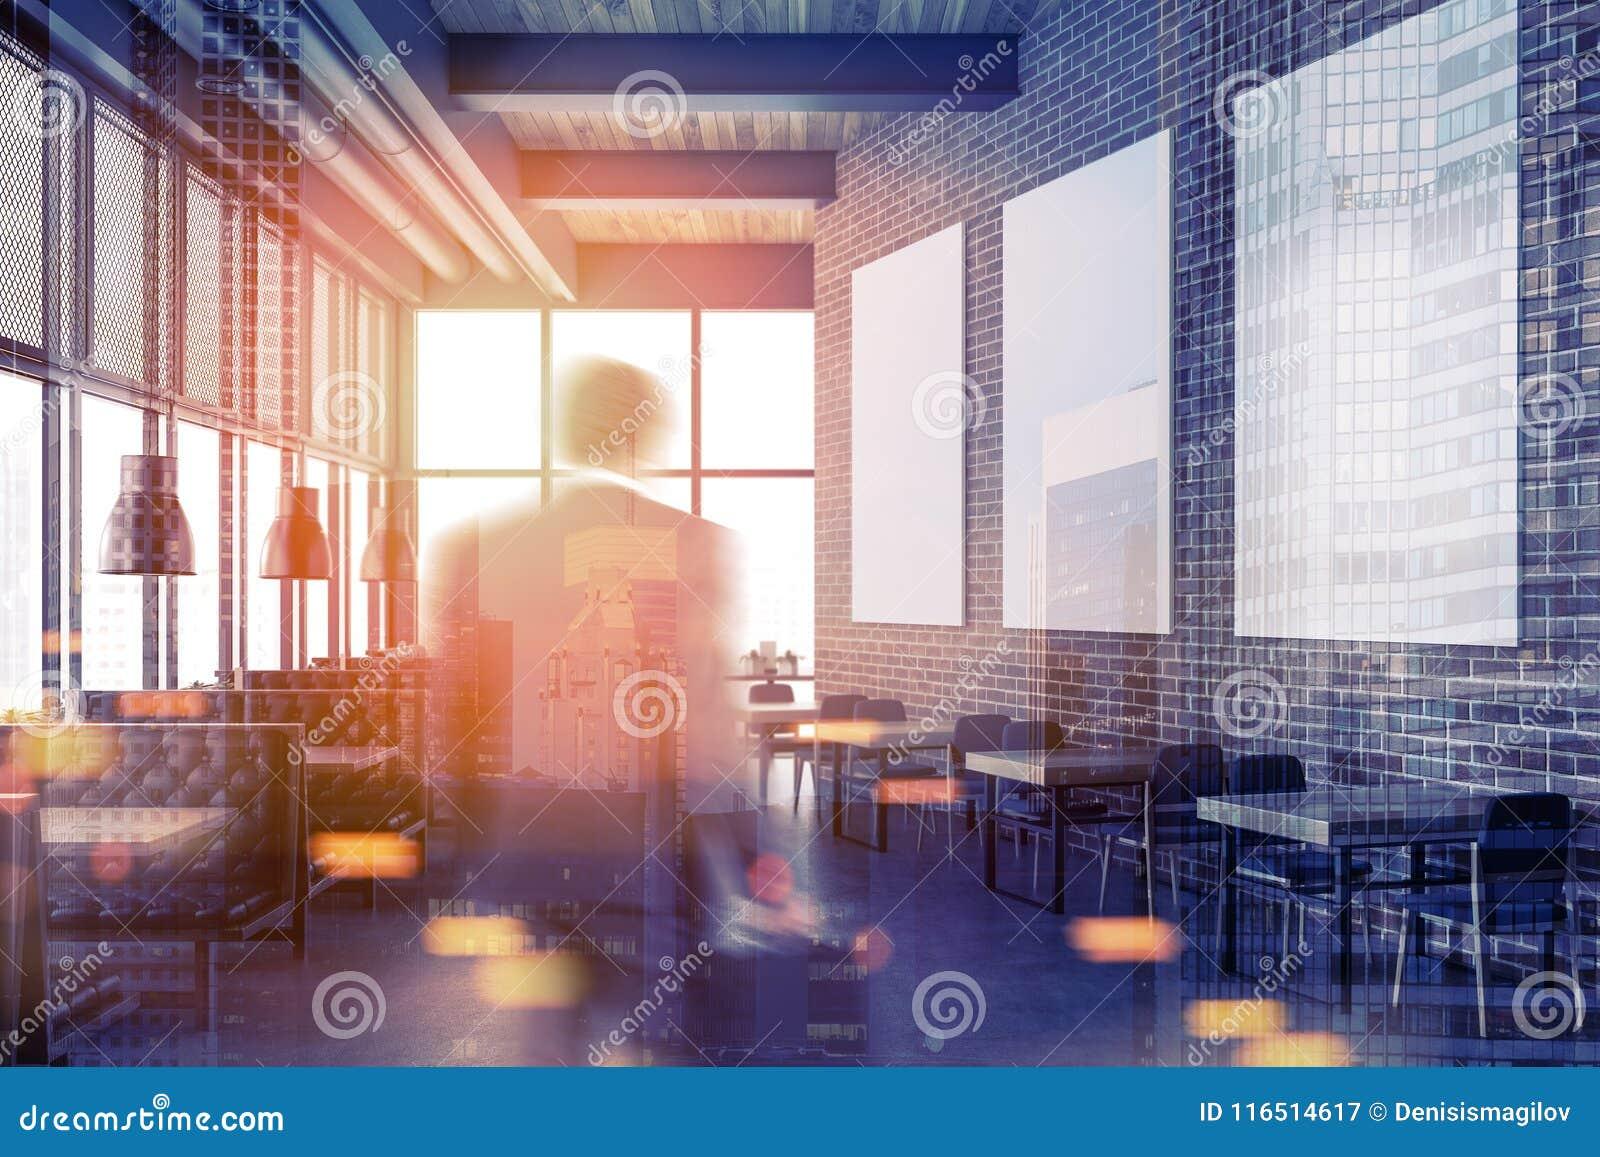 Luxury brick restaurant, poster gallery toned